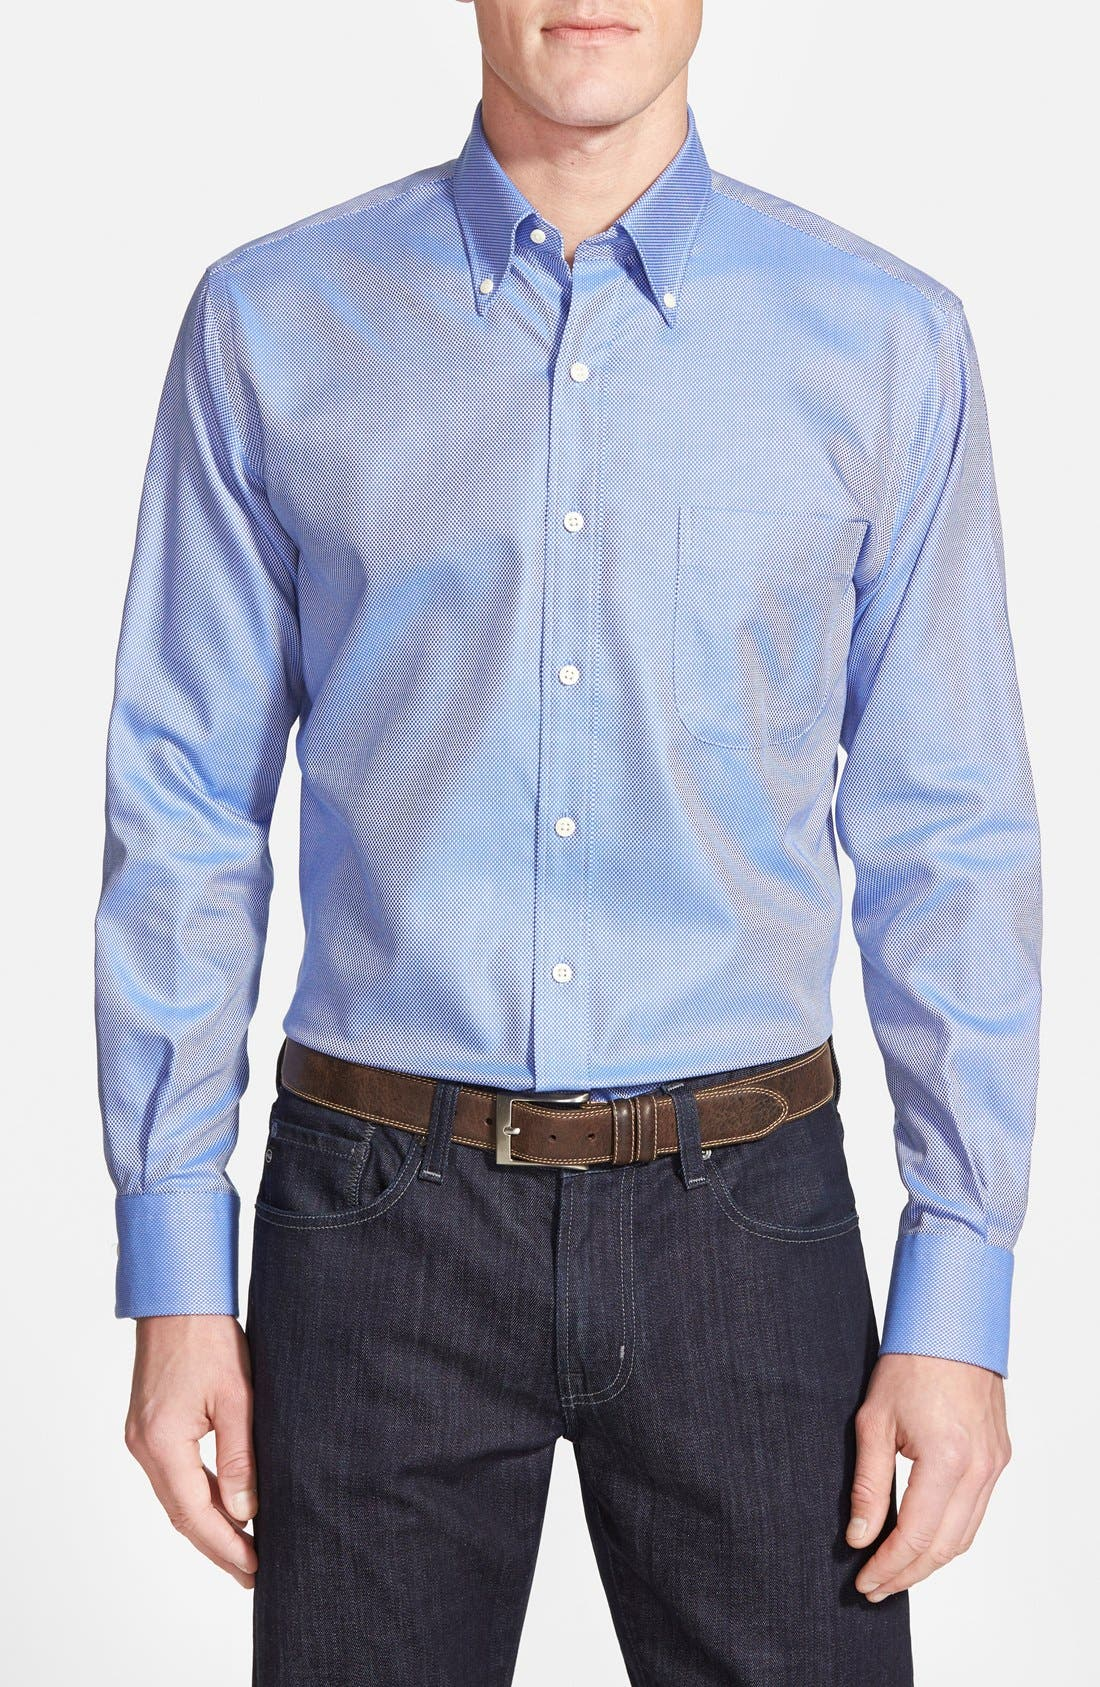 Main Image - Peter Millar 'Nanoluxe' Regular Fit Wrinkle Free Sport Shirt